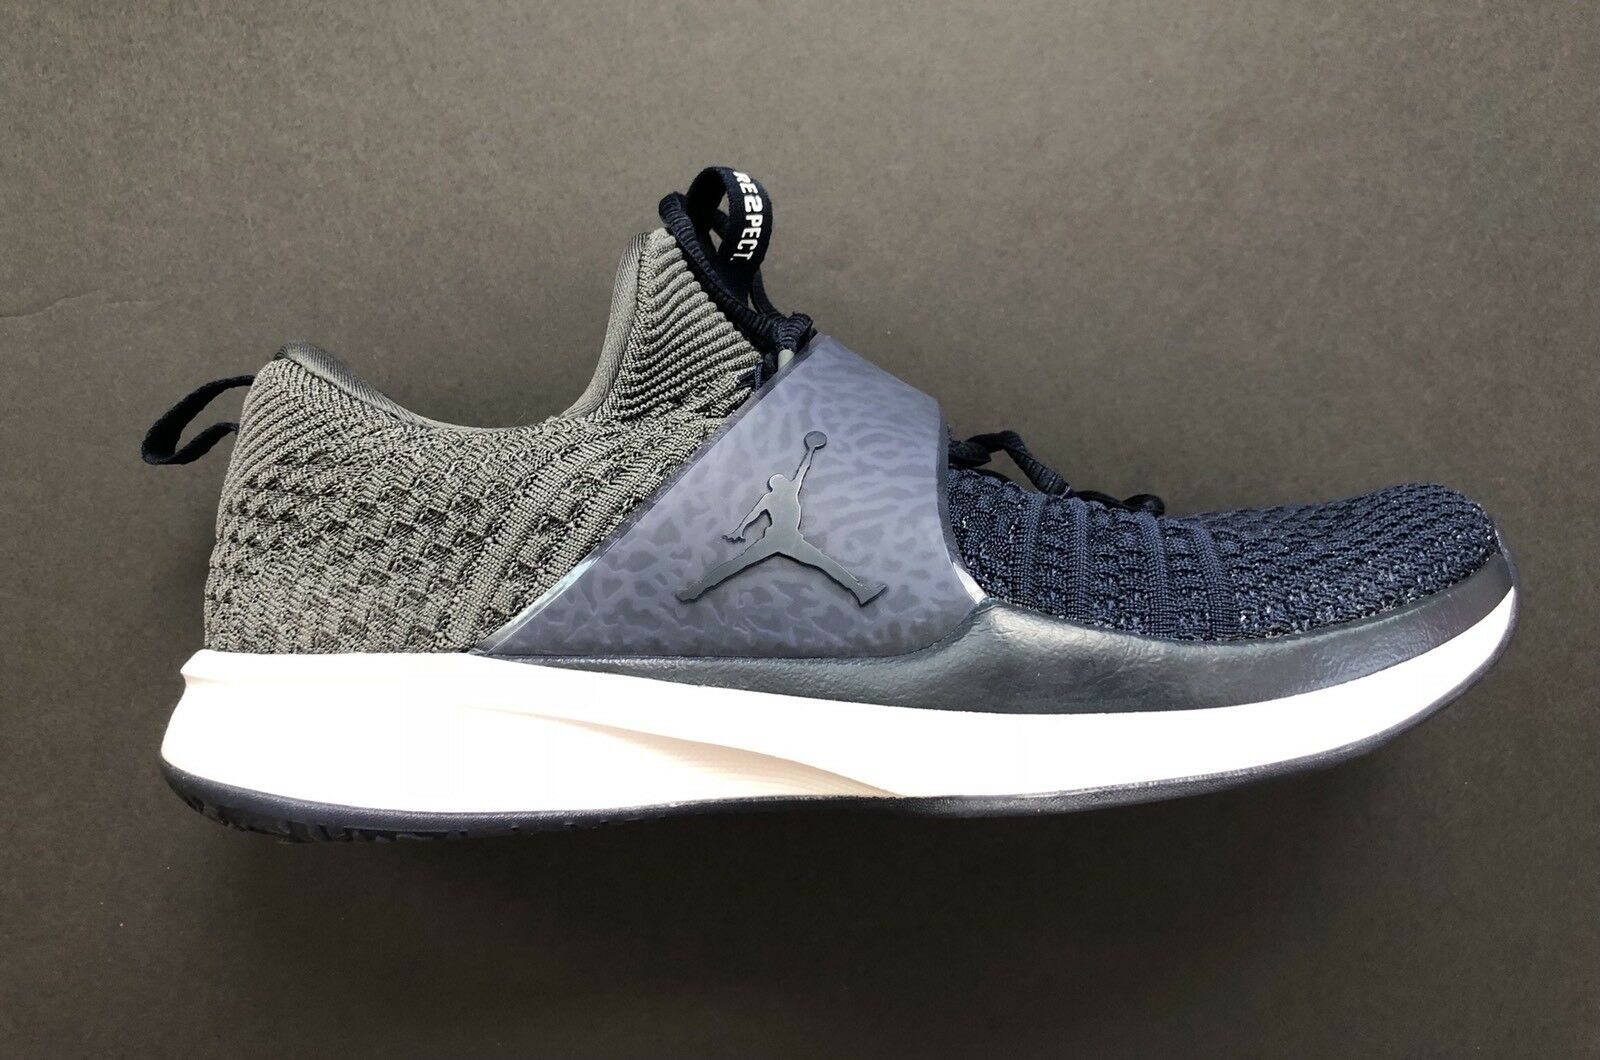 Nike Jordan Trainer 2 Flyknit Re2pect Size Derek Jeter Yankees 921210-106 Size Re2pect 14 19b282